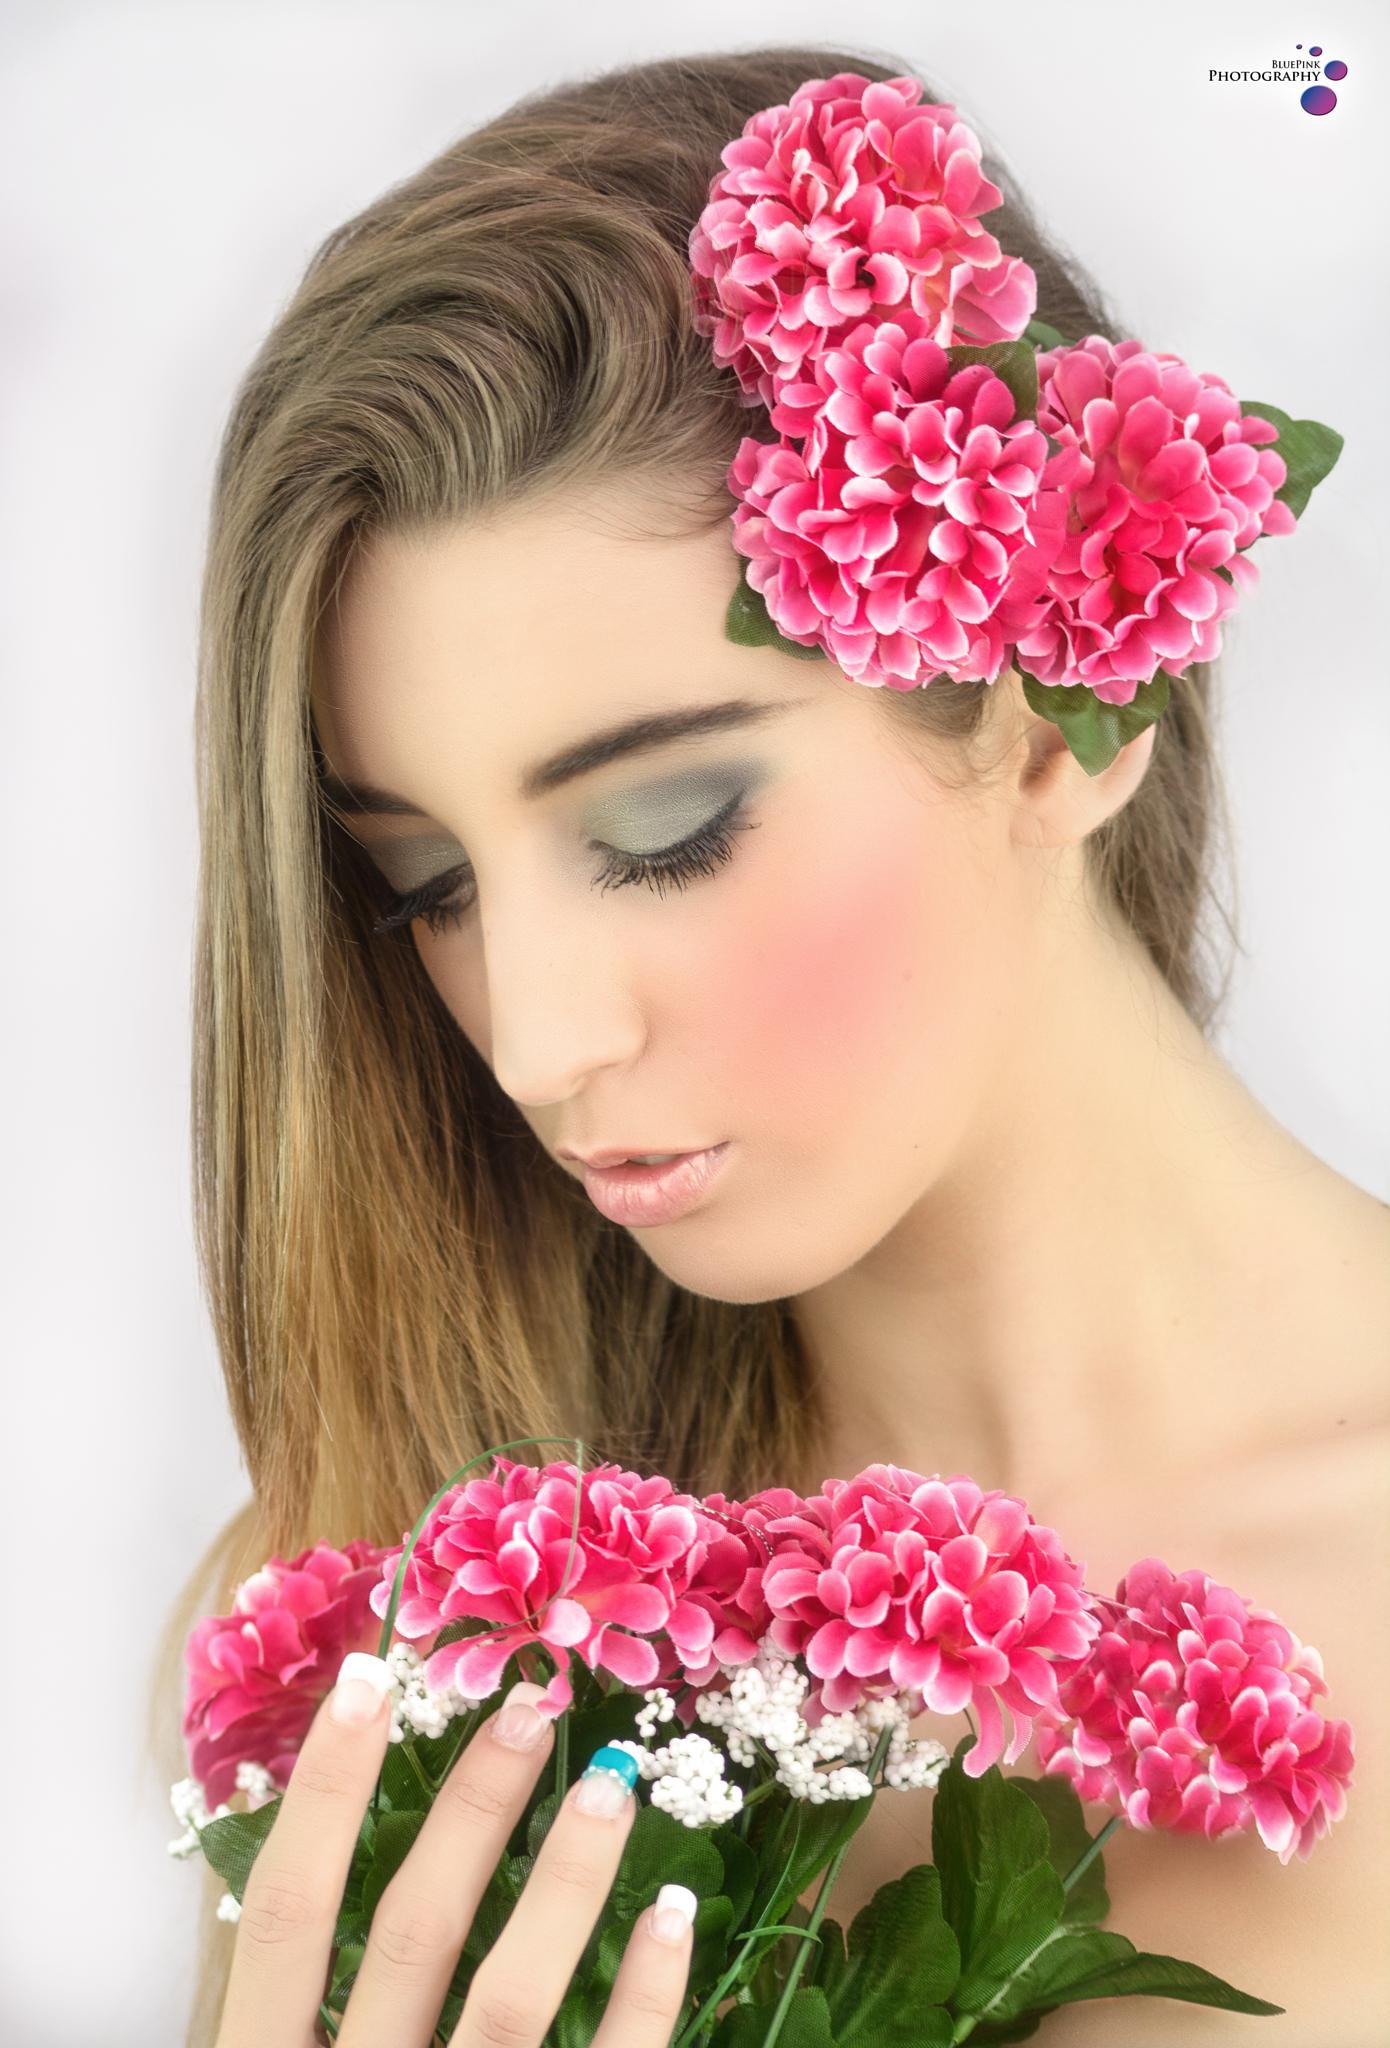 Beauty by Rosi Perez